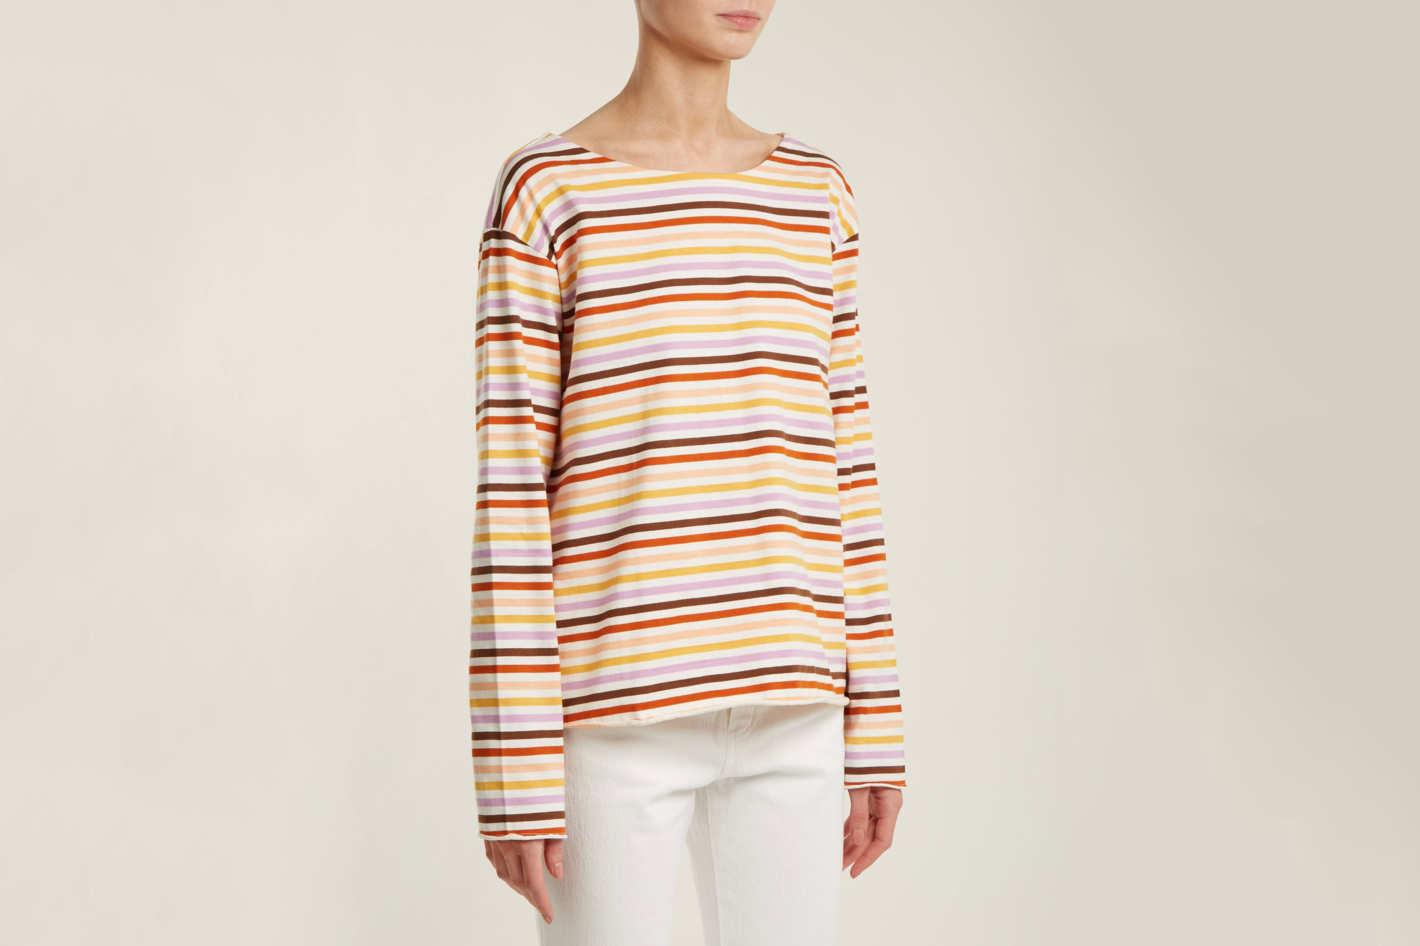 8359bdc811 M.I.H. Jeans Simple Striped Cotton-jersey Top